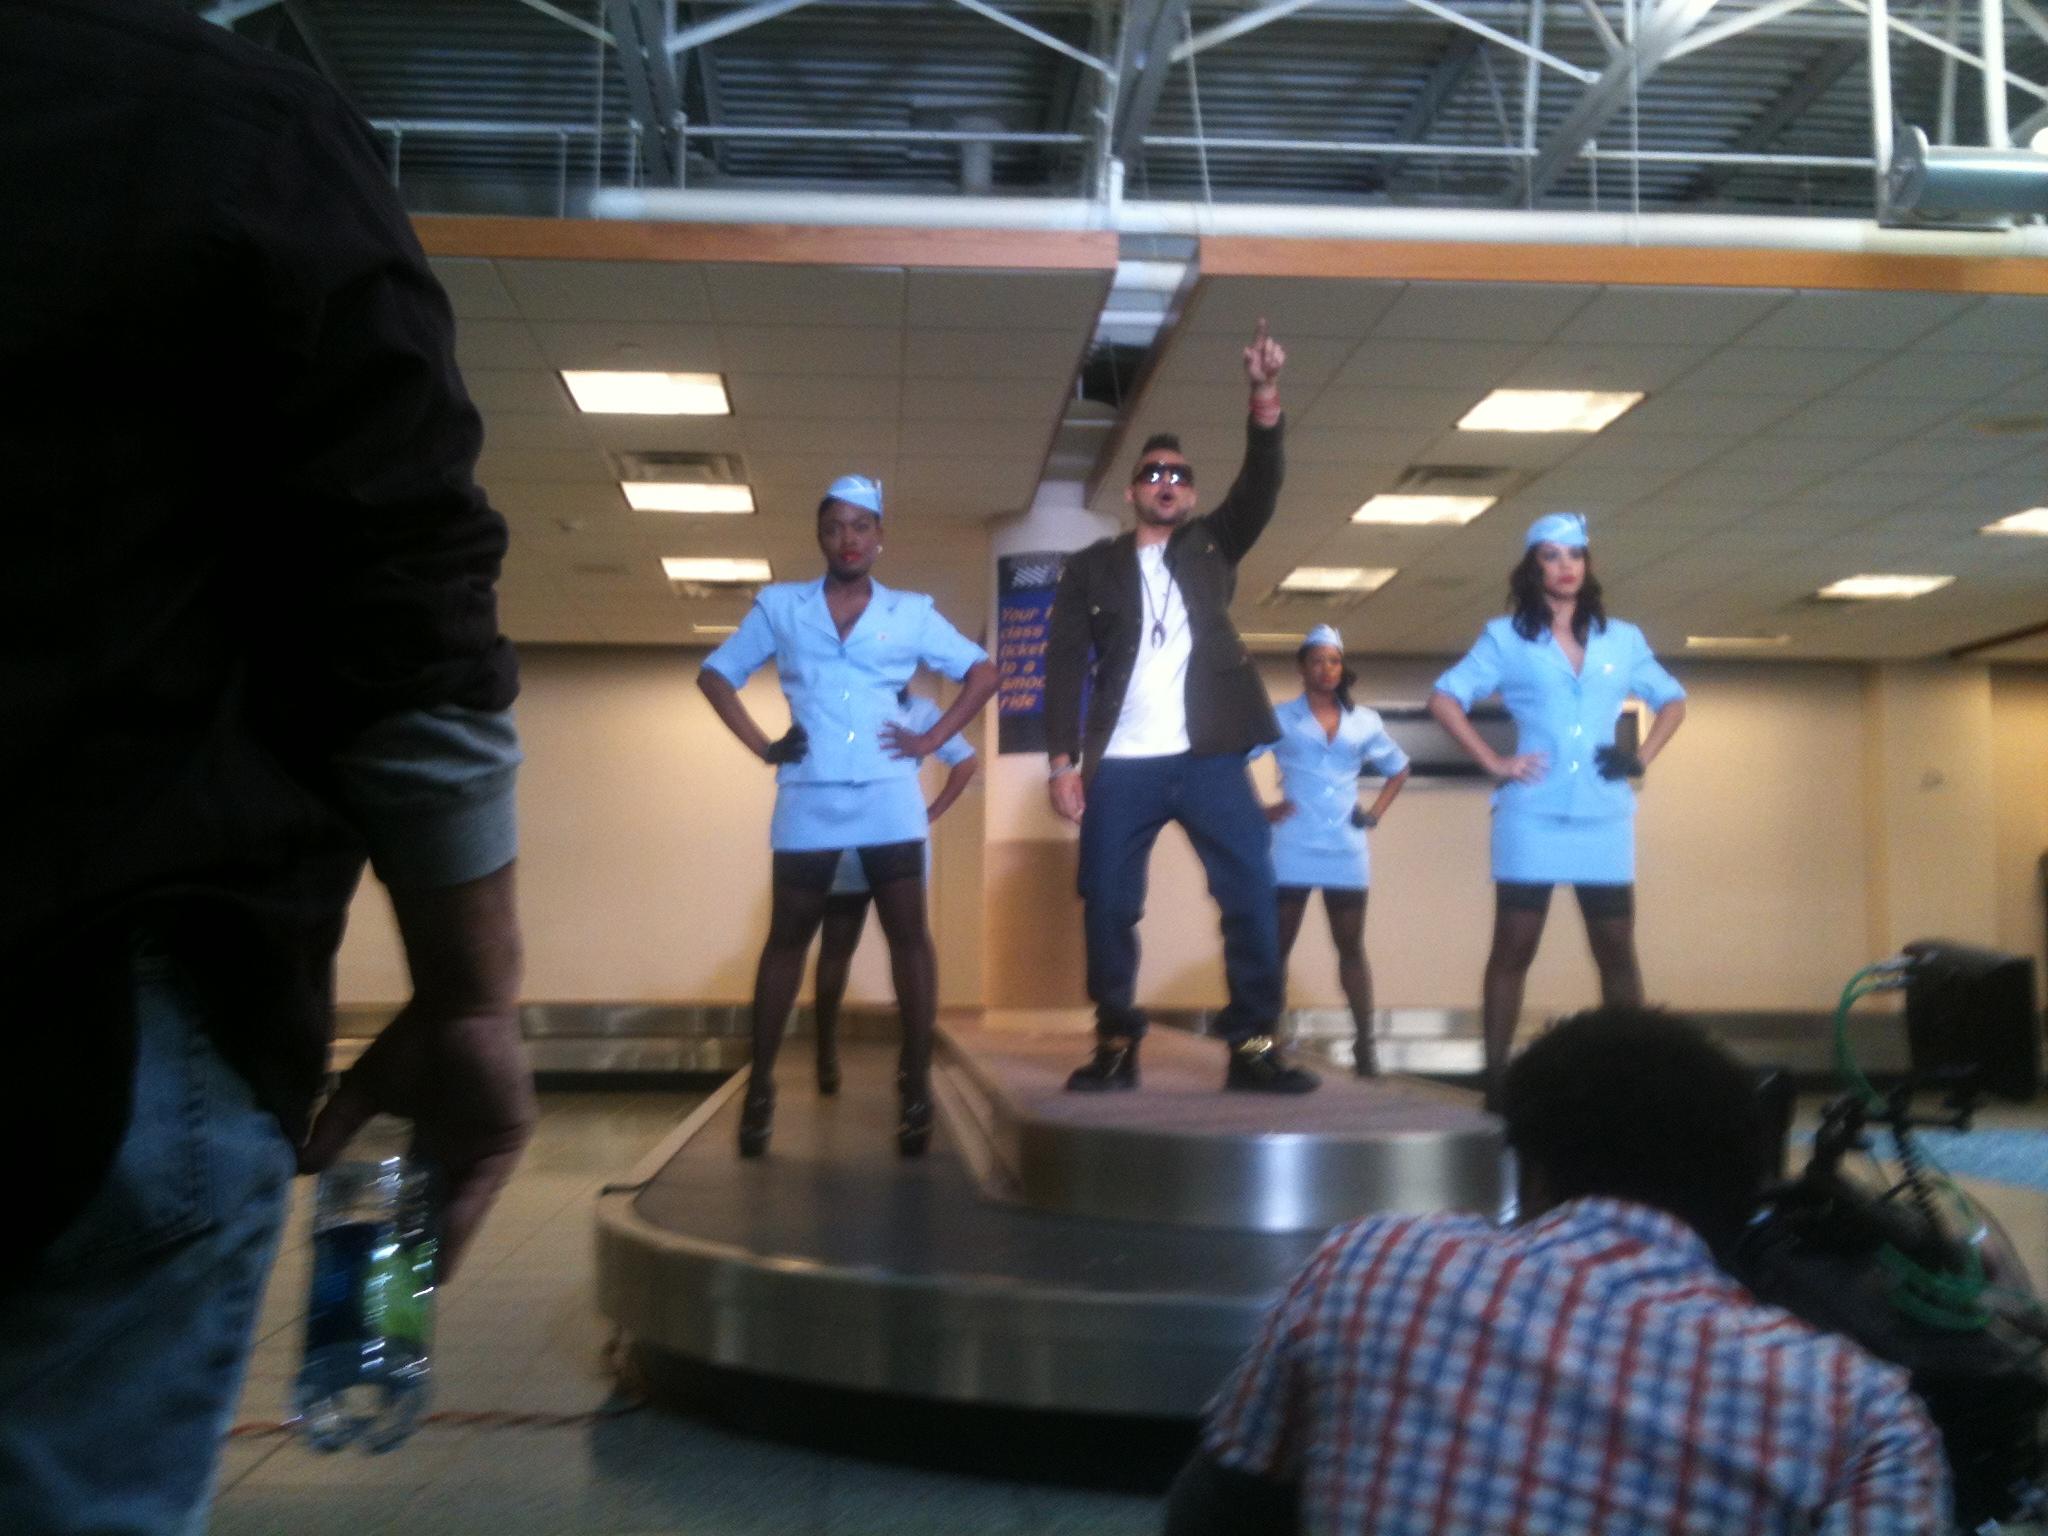 Sean Paul and flight attendants